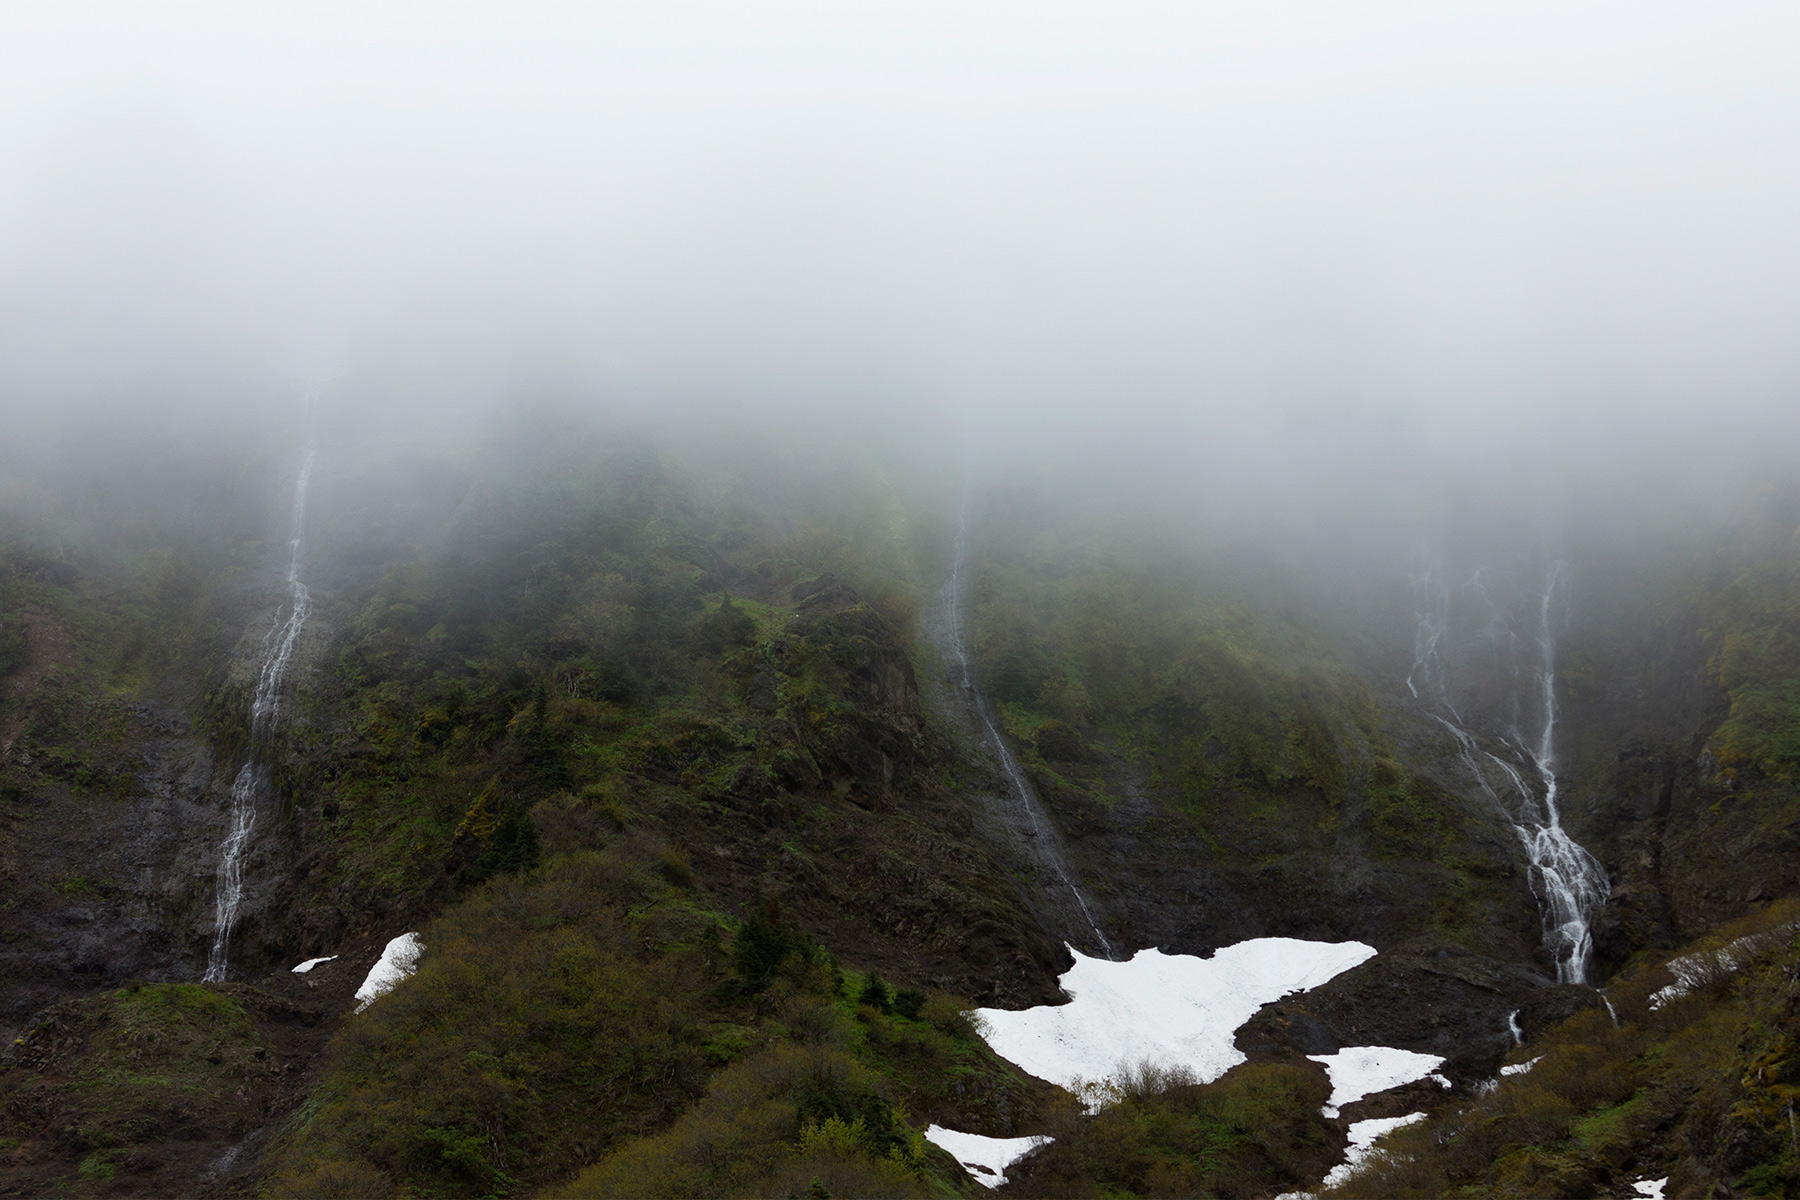 Morning Mist on the Yocum Ridge Falls - Christopher Lisle